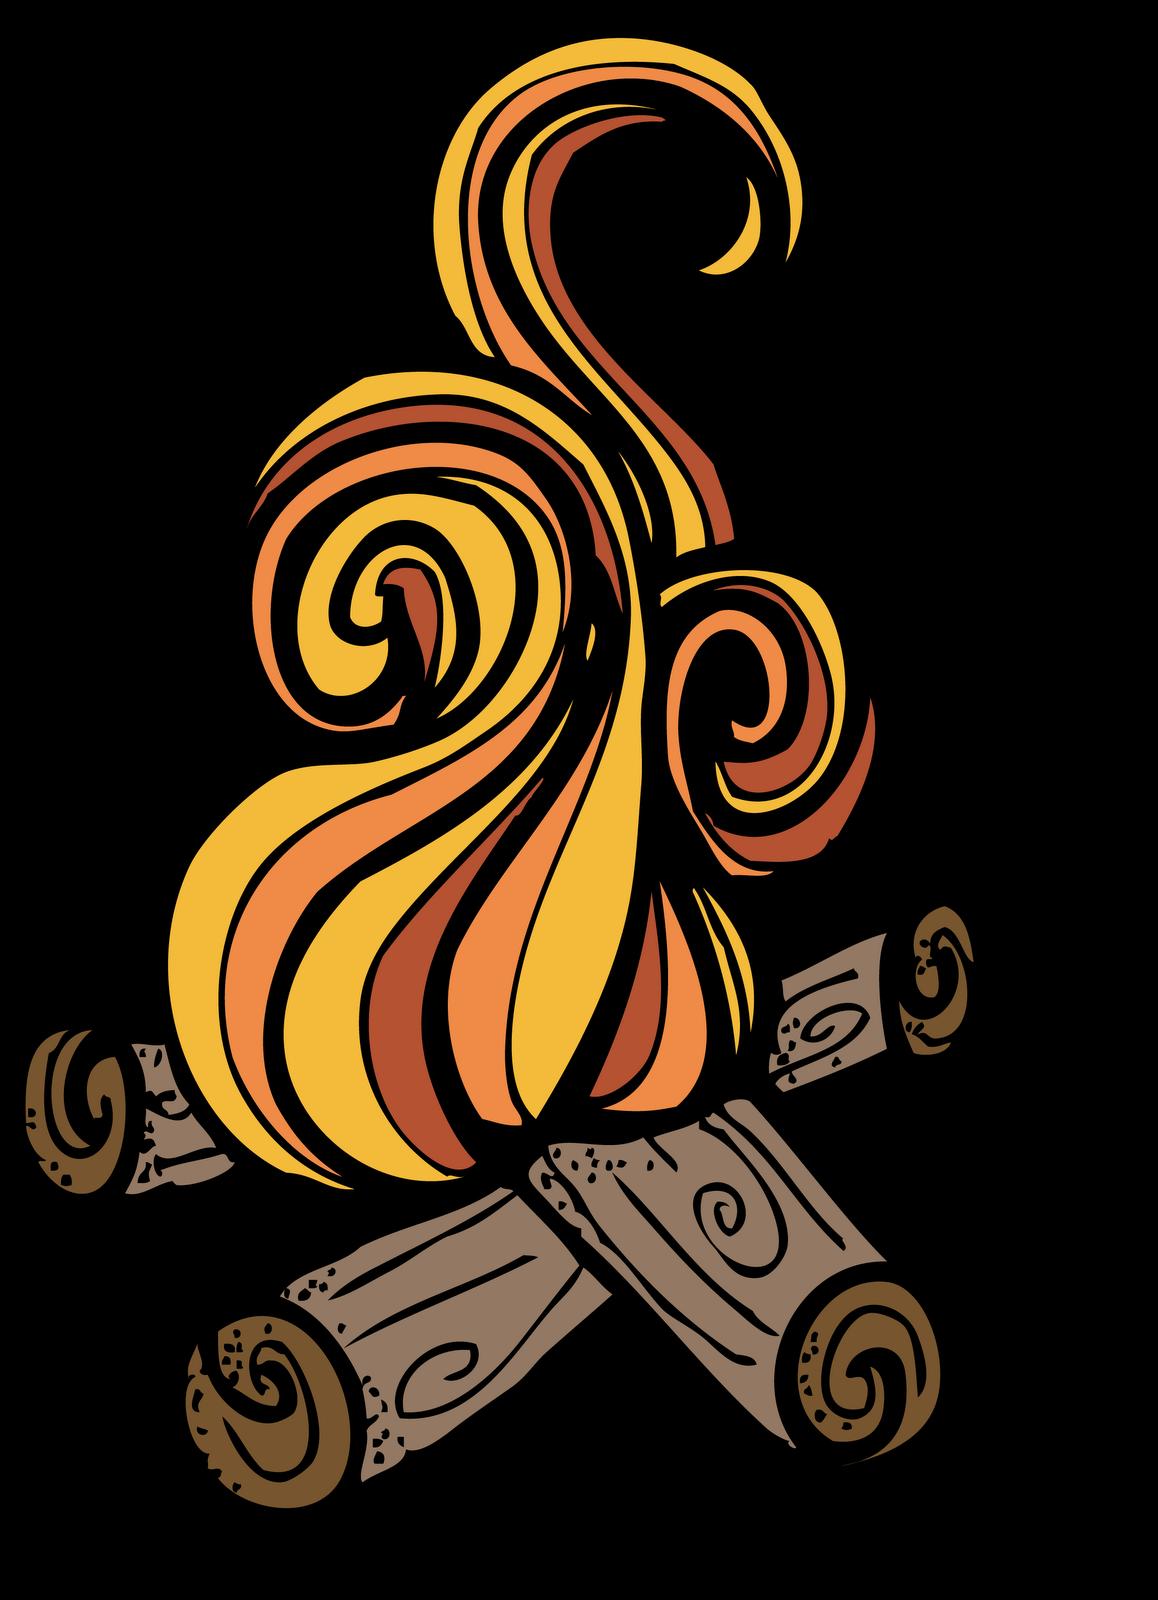 1158x1600 Campfire Camp Fire Clip Art Image